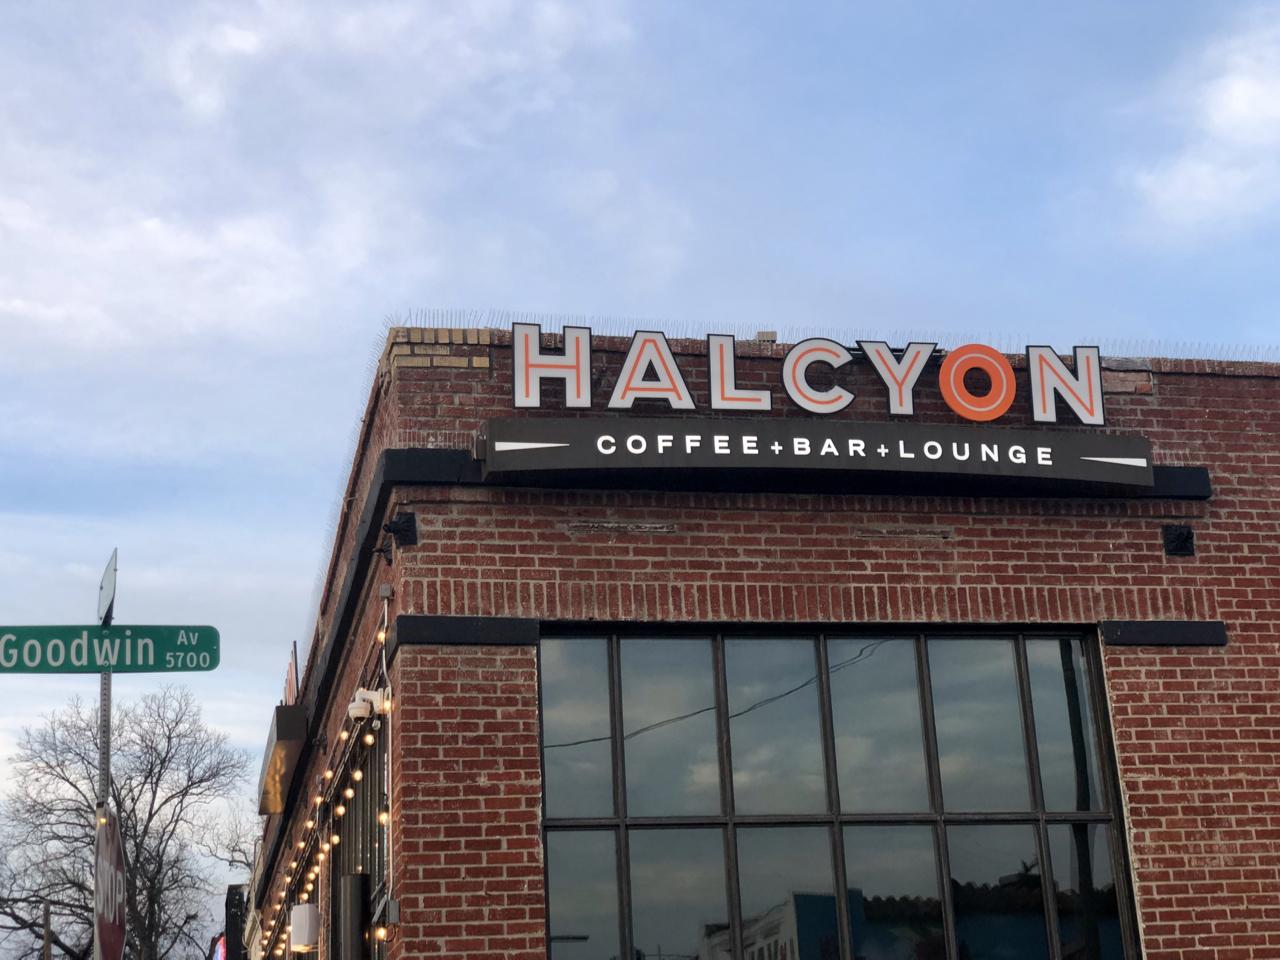 Status: Halcyon